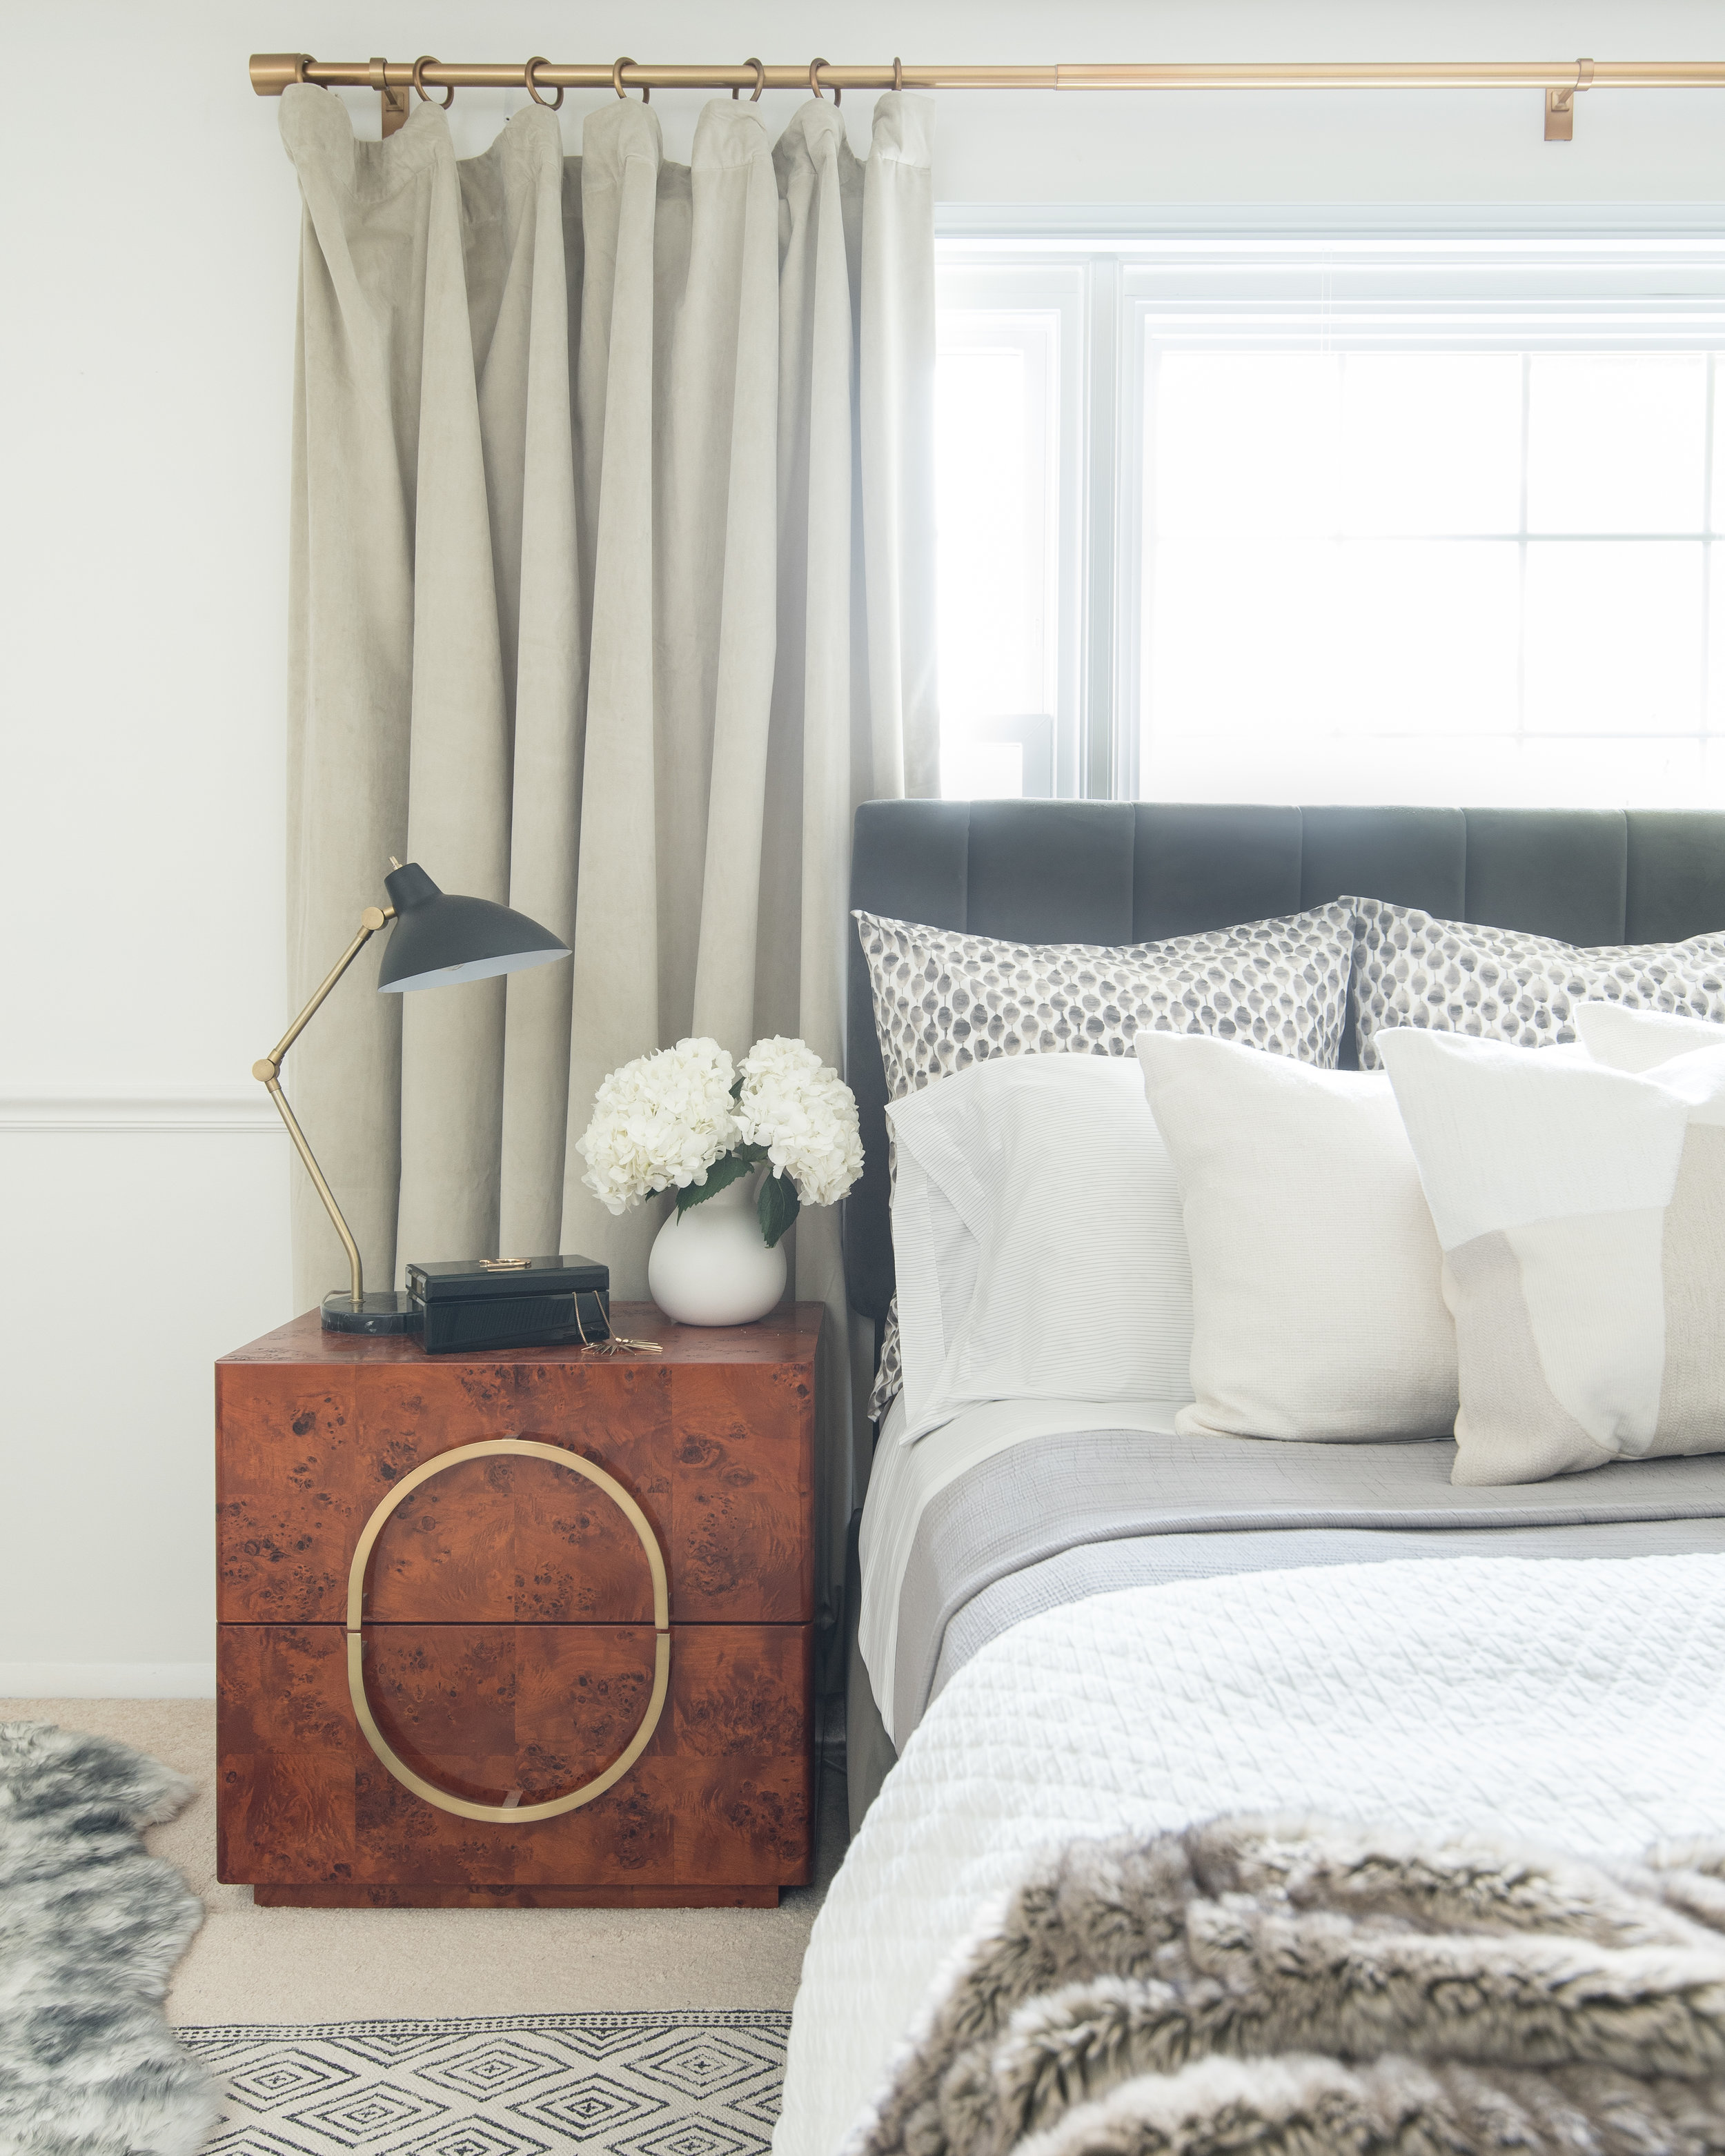 master-bedroom-decor-interiors-mariella-cruzado-splendor-styling-dc-md.jpg